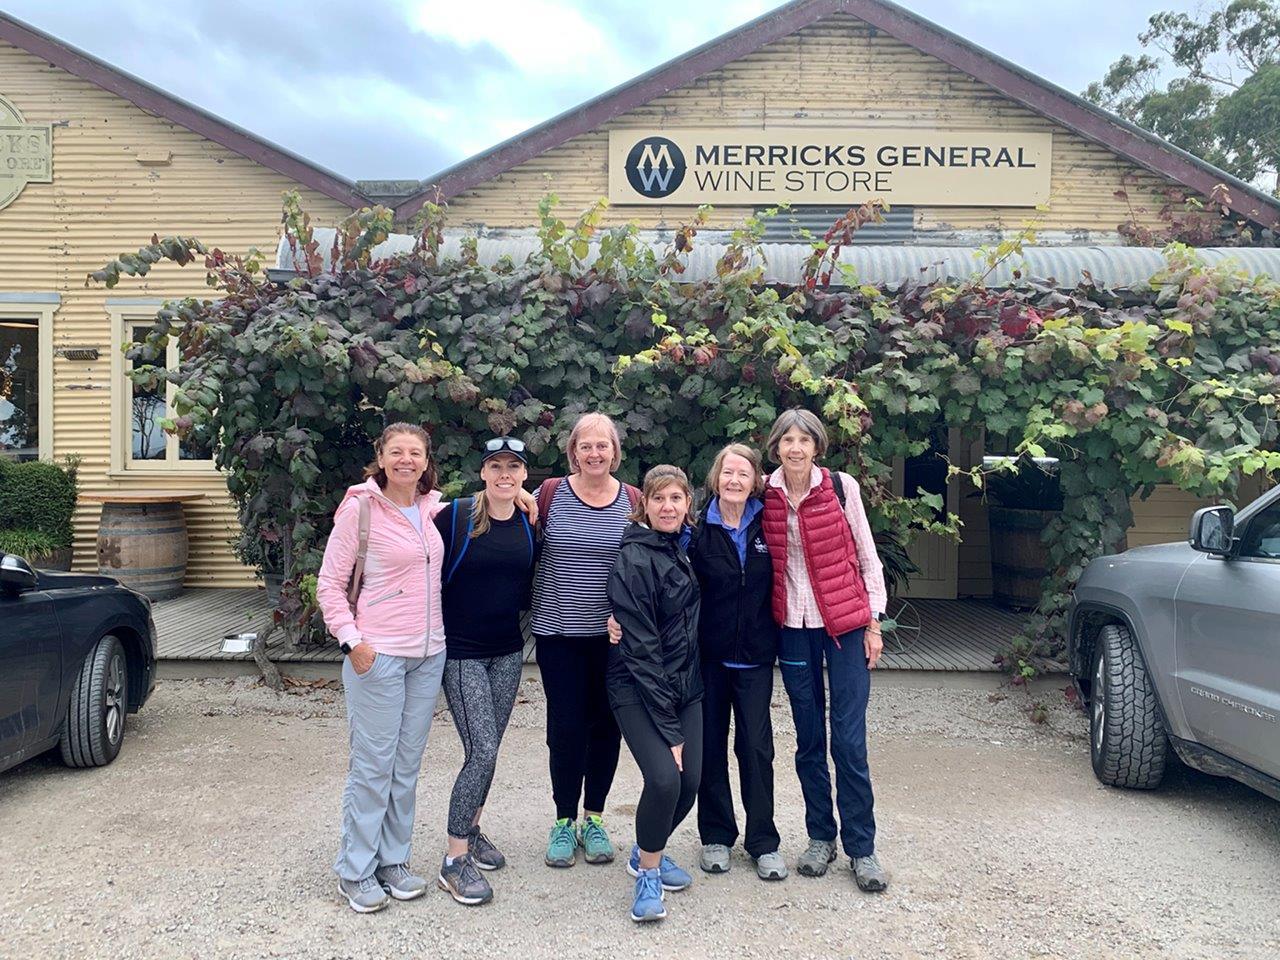 Merrick's General Wine Store